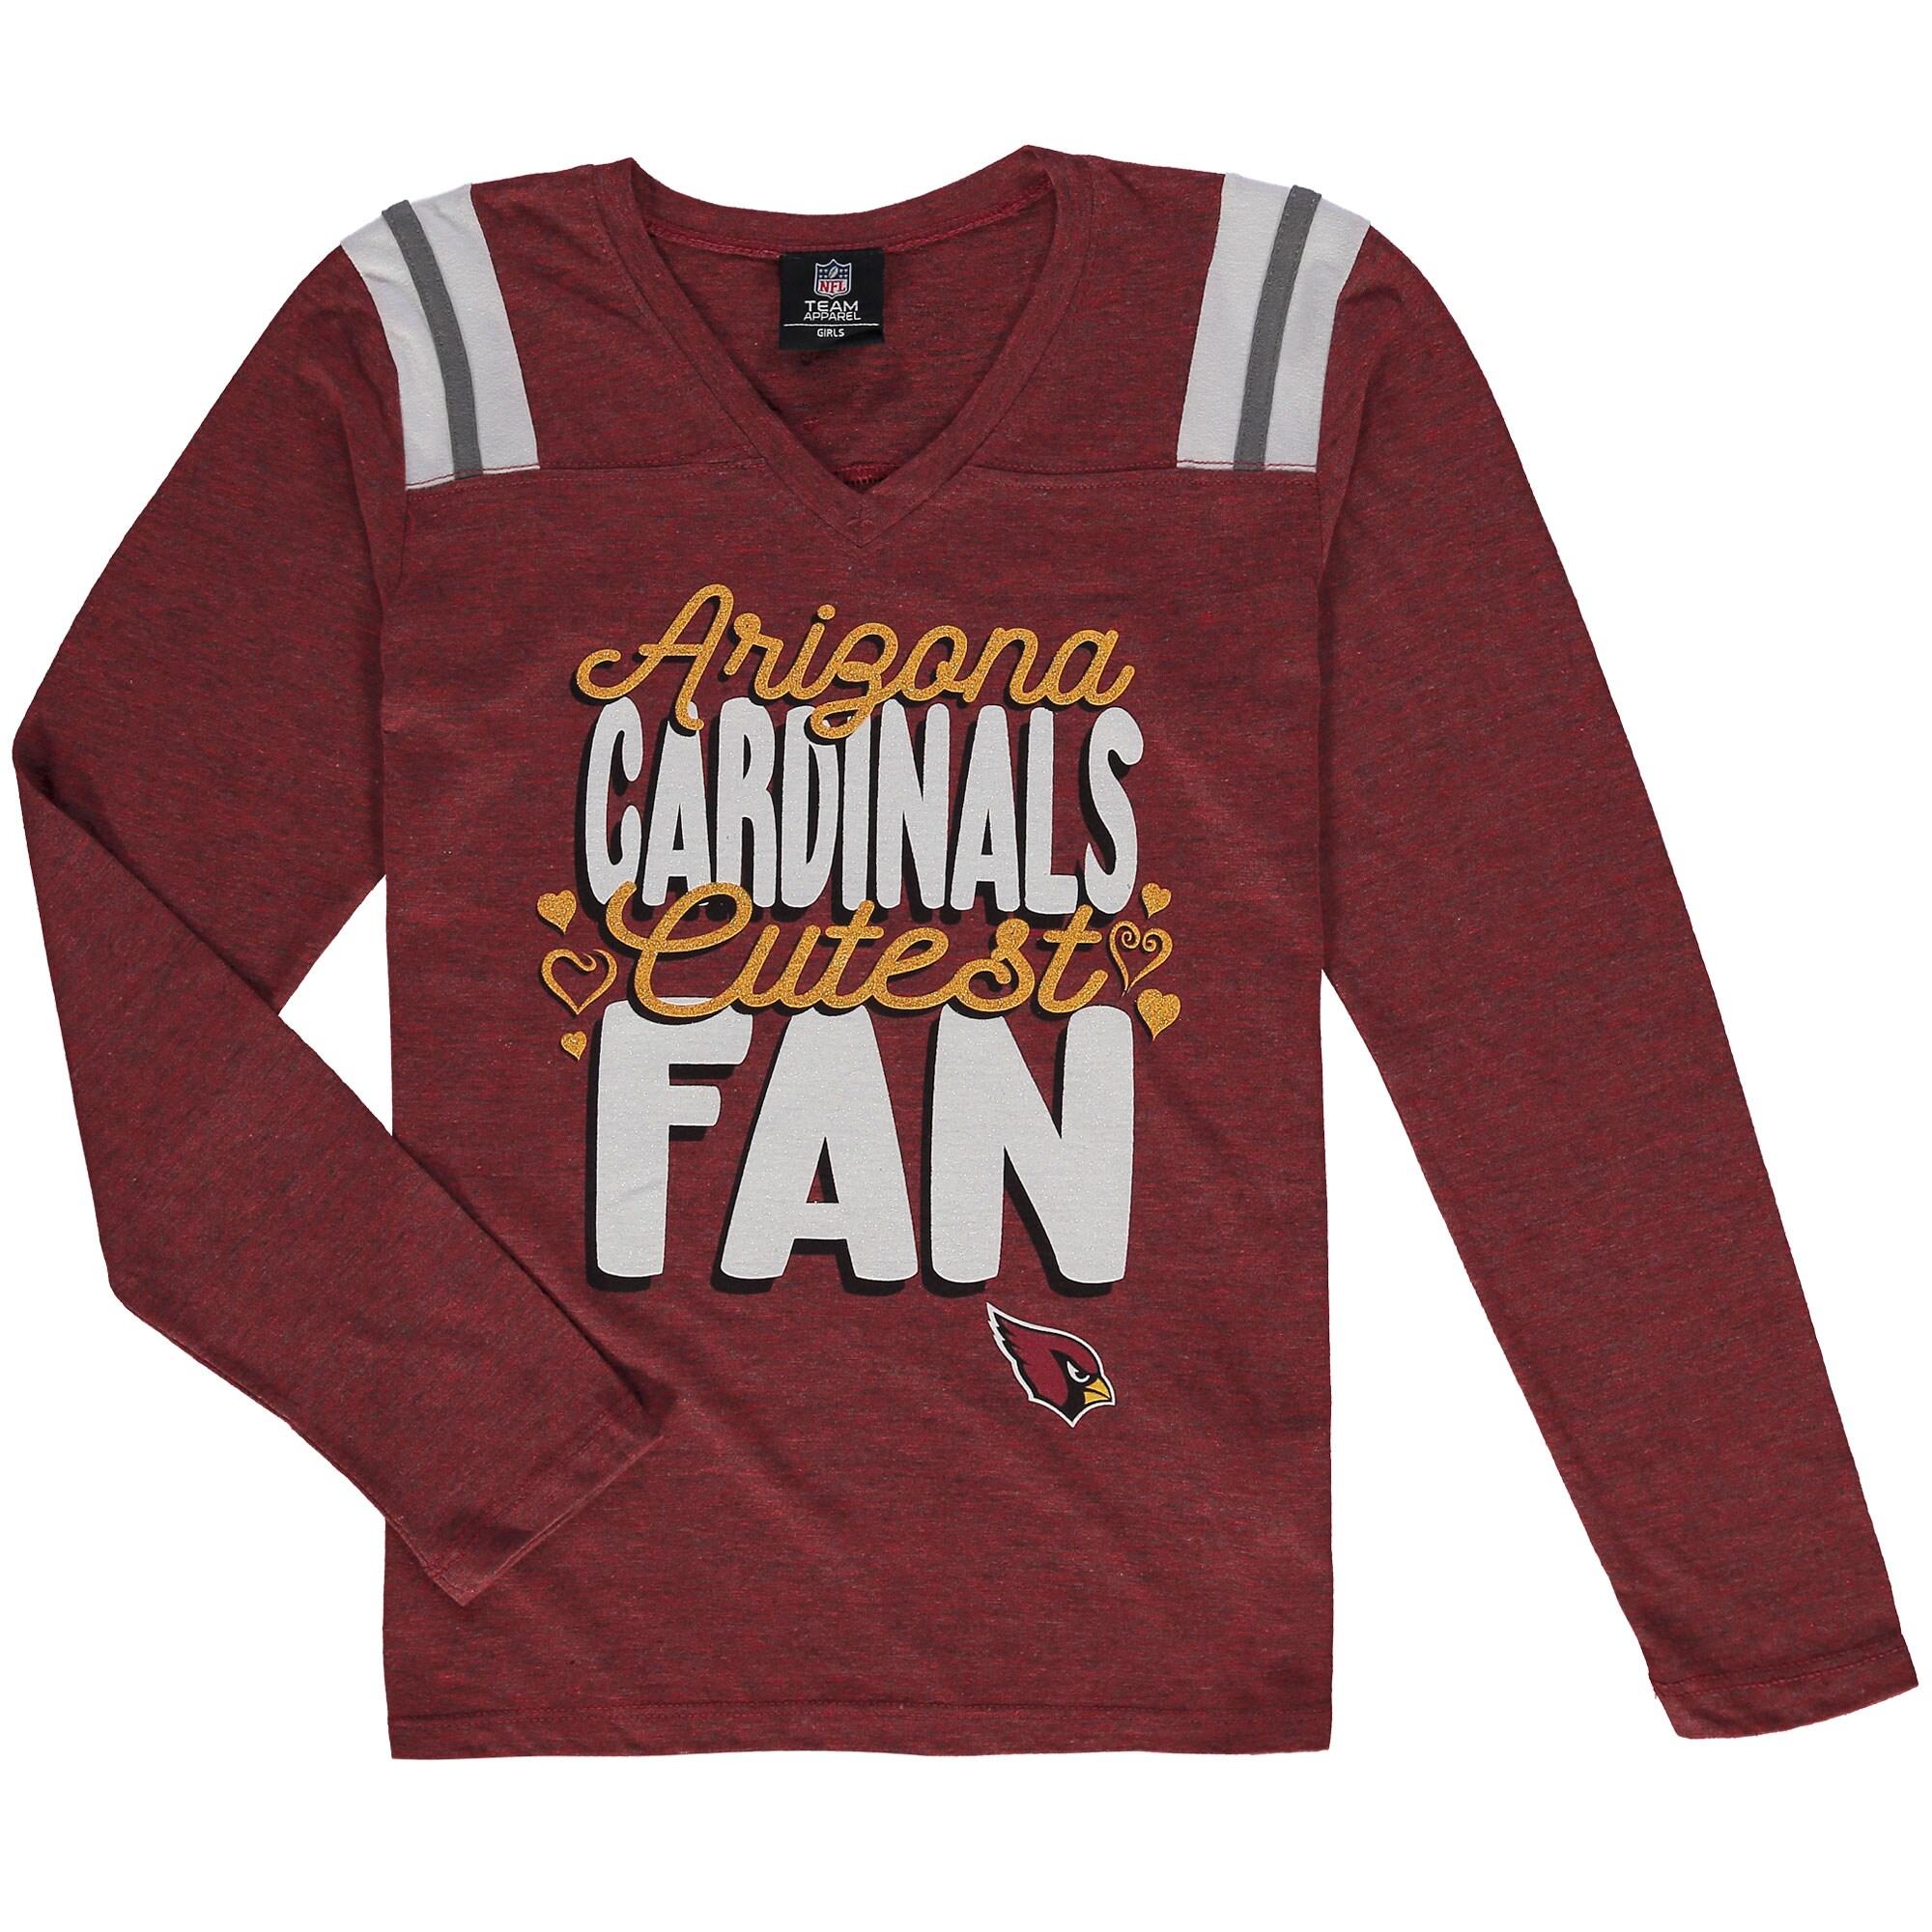 Arizona Cardinals 5th & Ocean by New Era Girls Youth Cutest Fan Tri-Blend V-Neck Long Sleeve T-Shirt - Cardinal